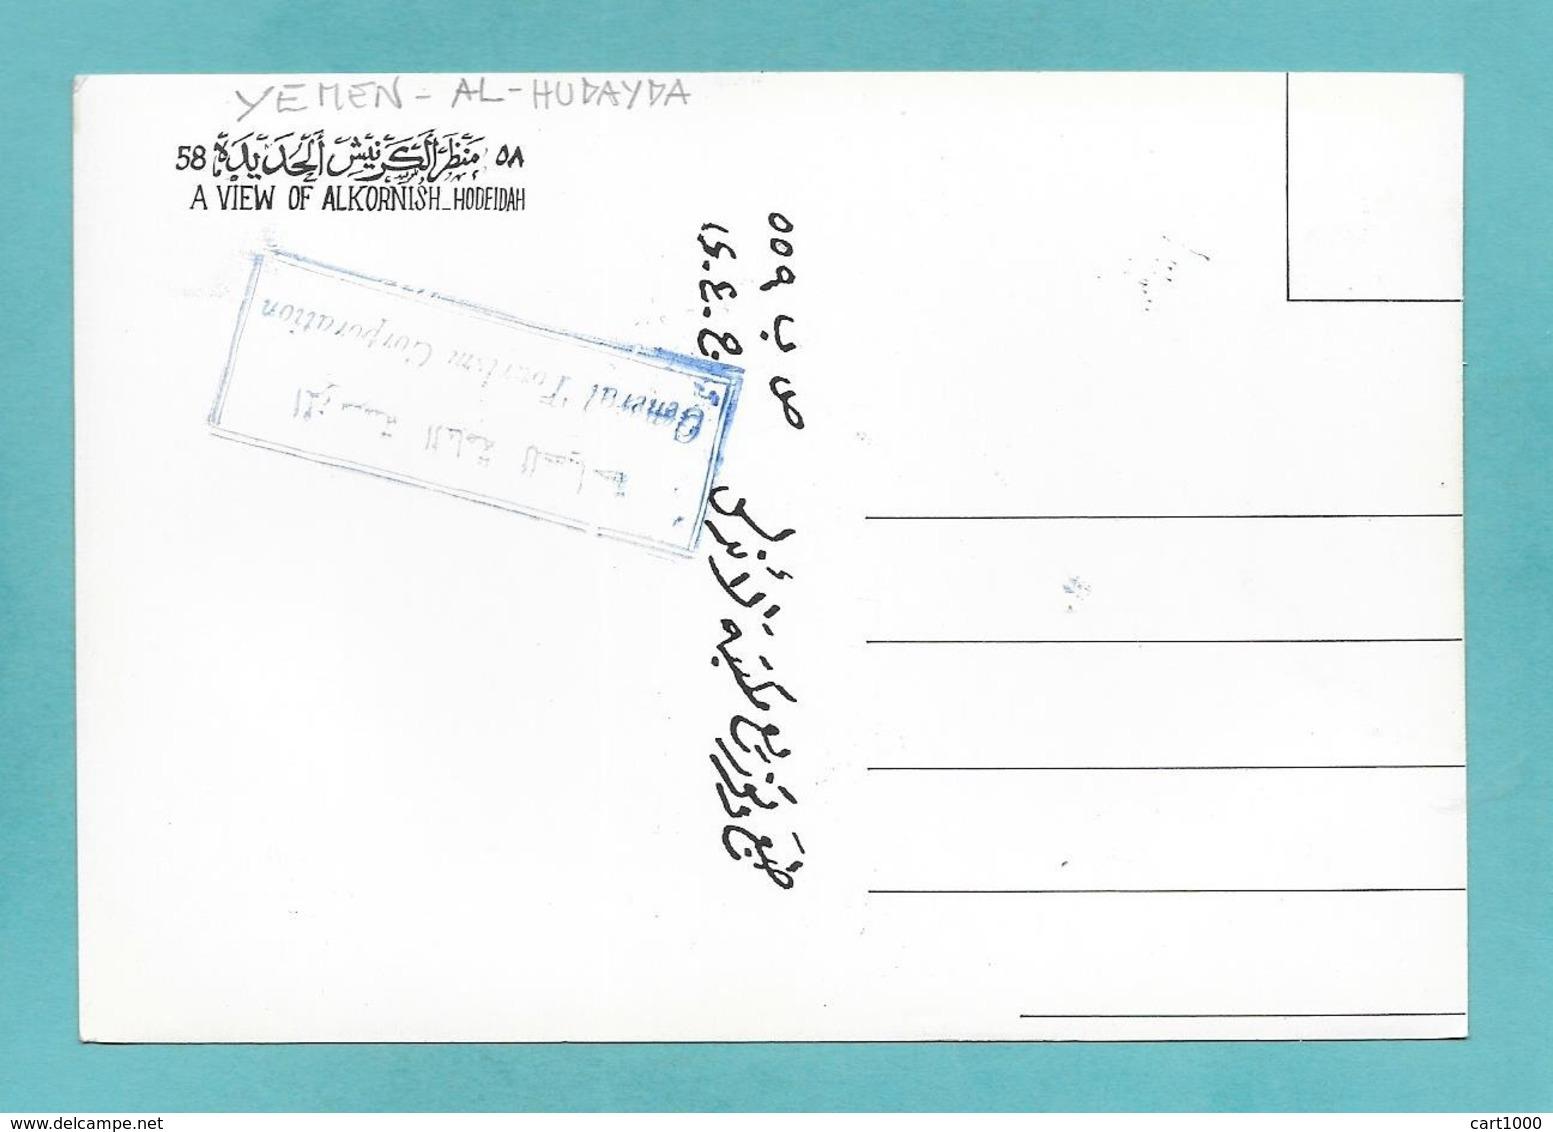 YEMEN ALKORNISH-HODEIDAH AL-HUDAYDA - Yemen